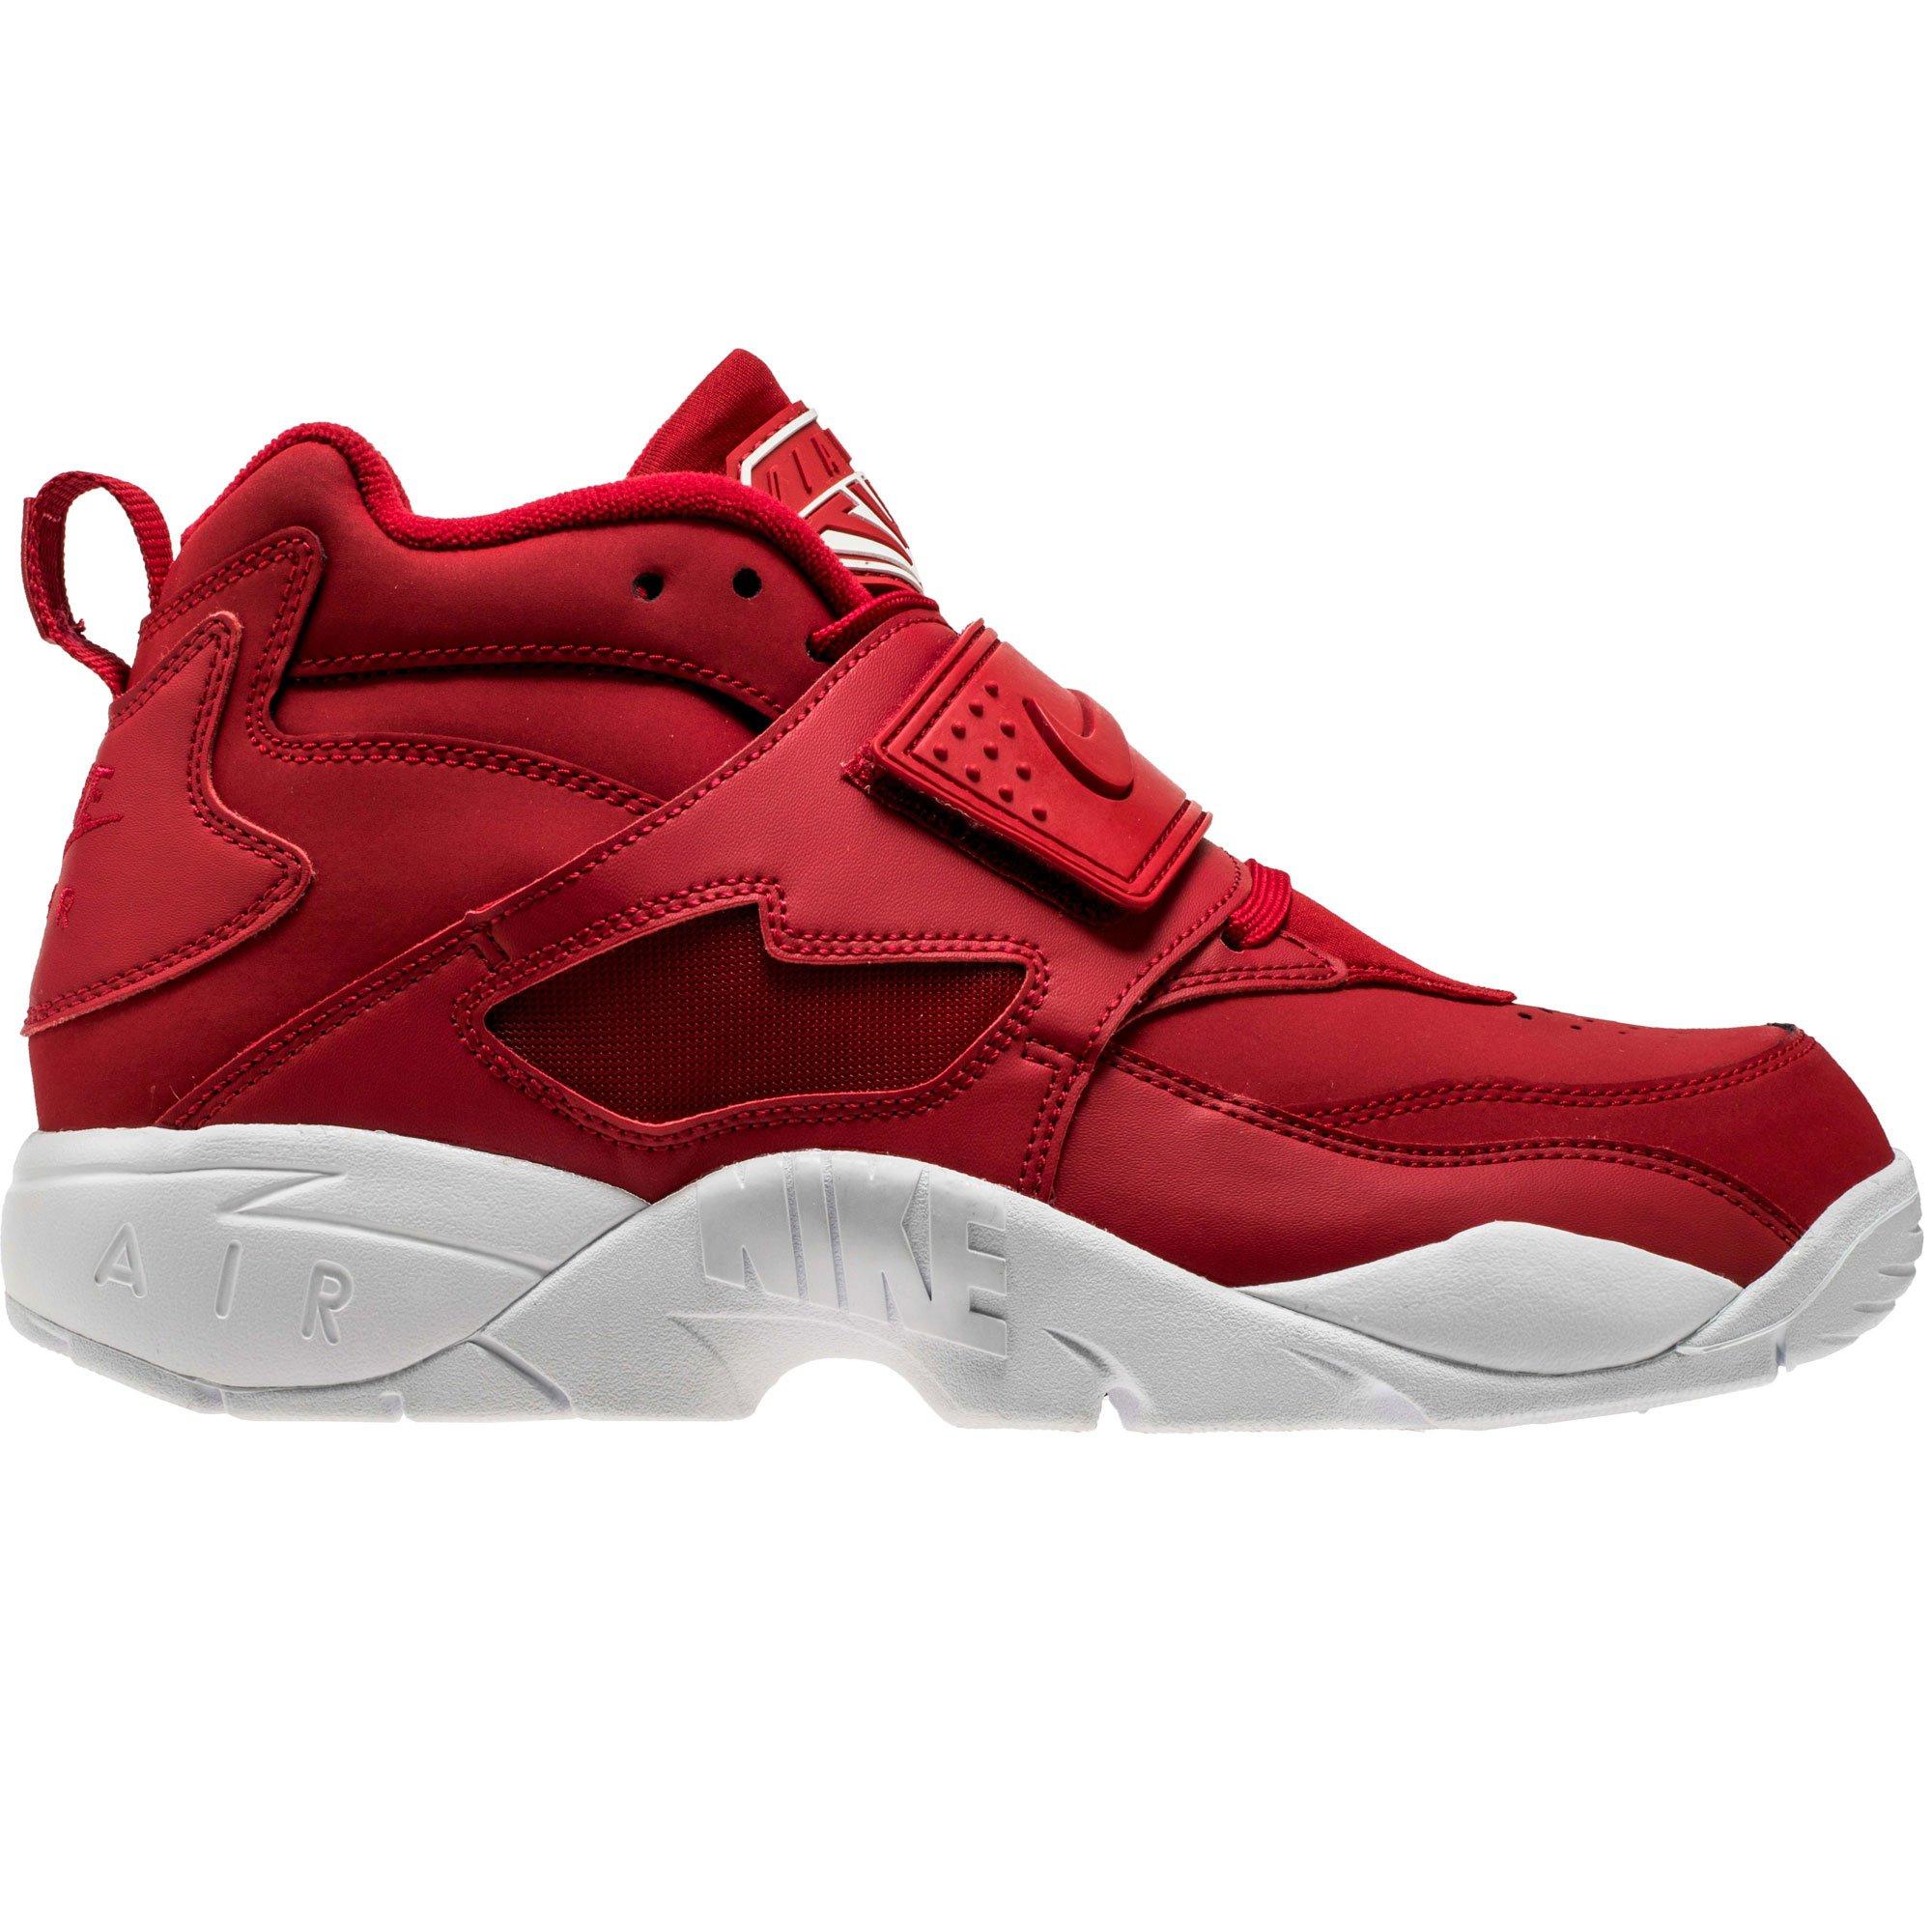 Nike Men's Air Diamond Turf Red/White 309434-600 (Size: 8) by Nike (Image #1)